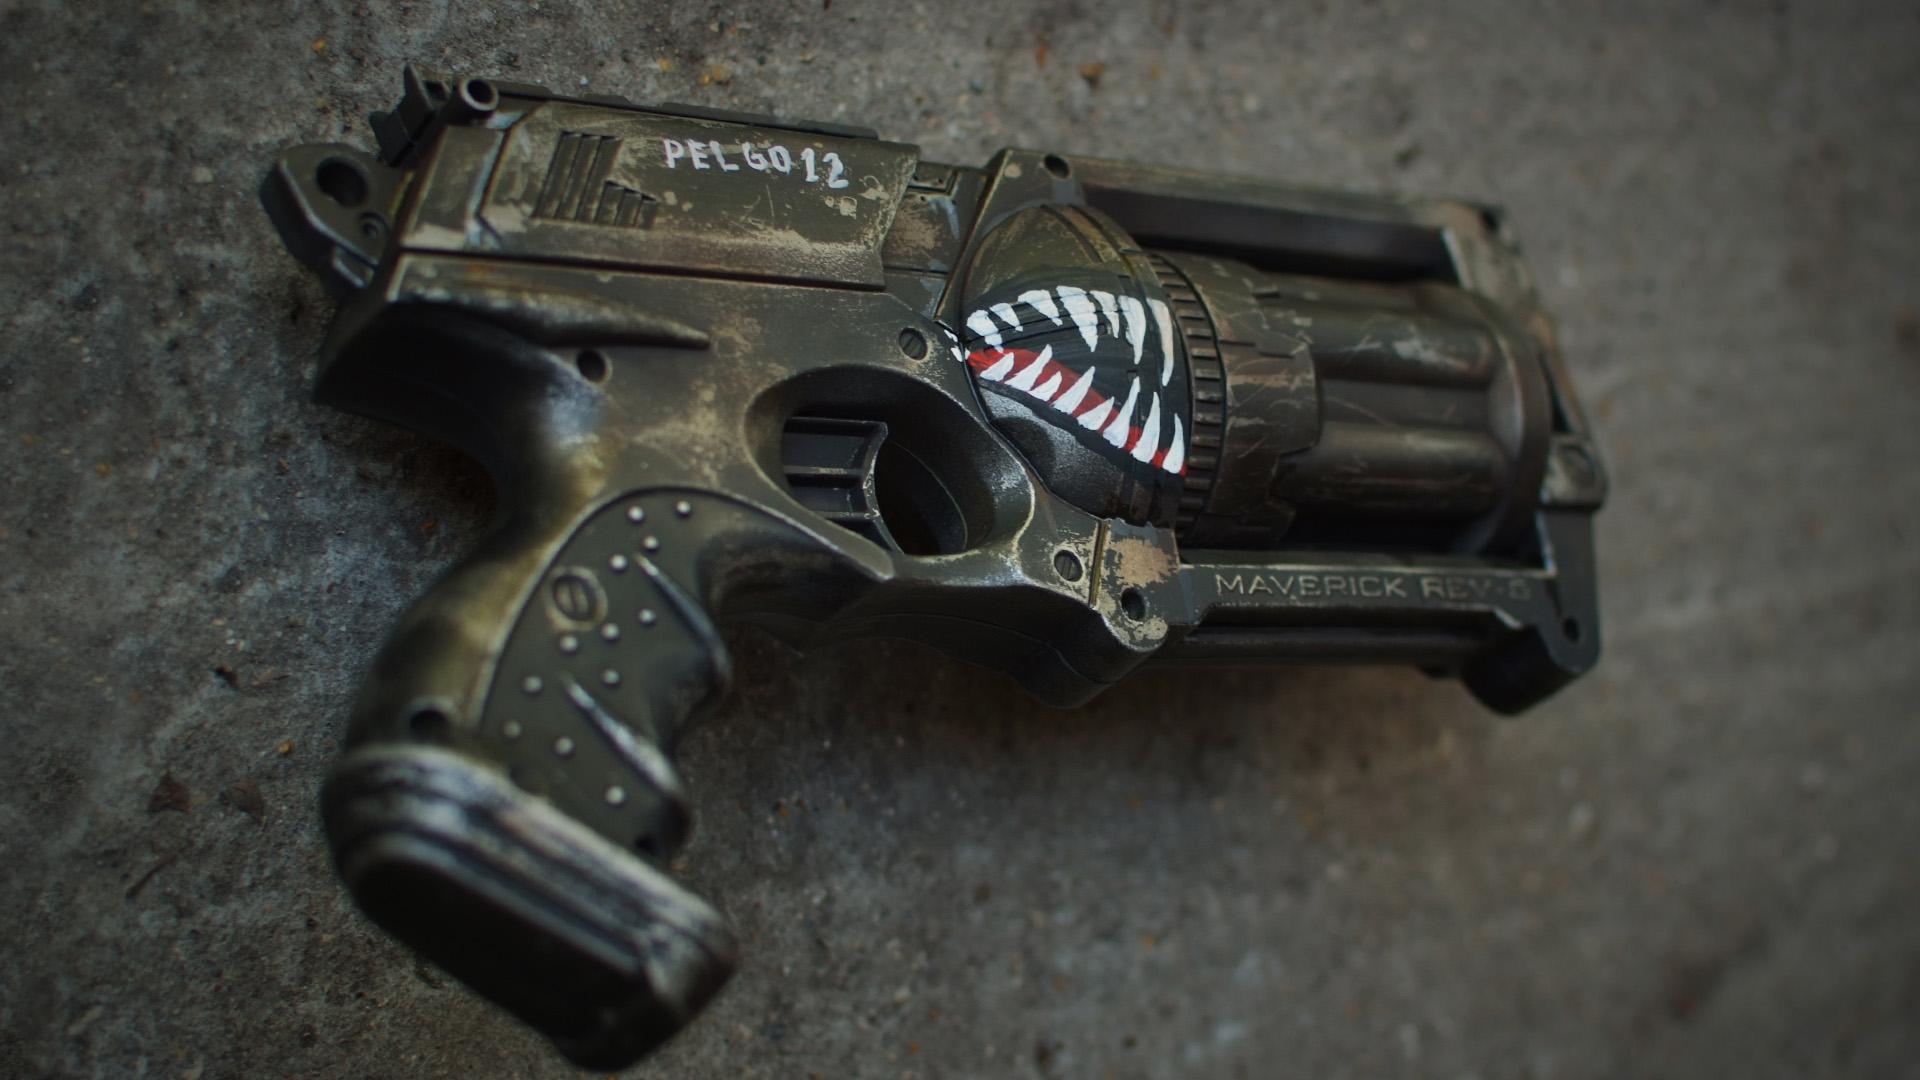 Future Nerf Guns 2014 Nerf brink ritchieFuture Nerf Guns 2014